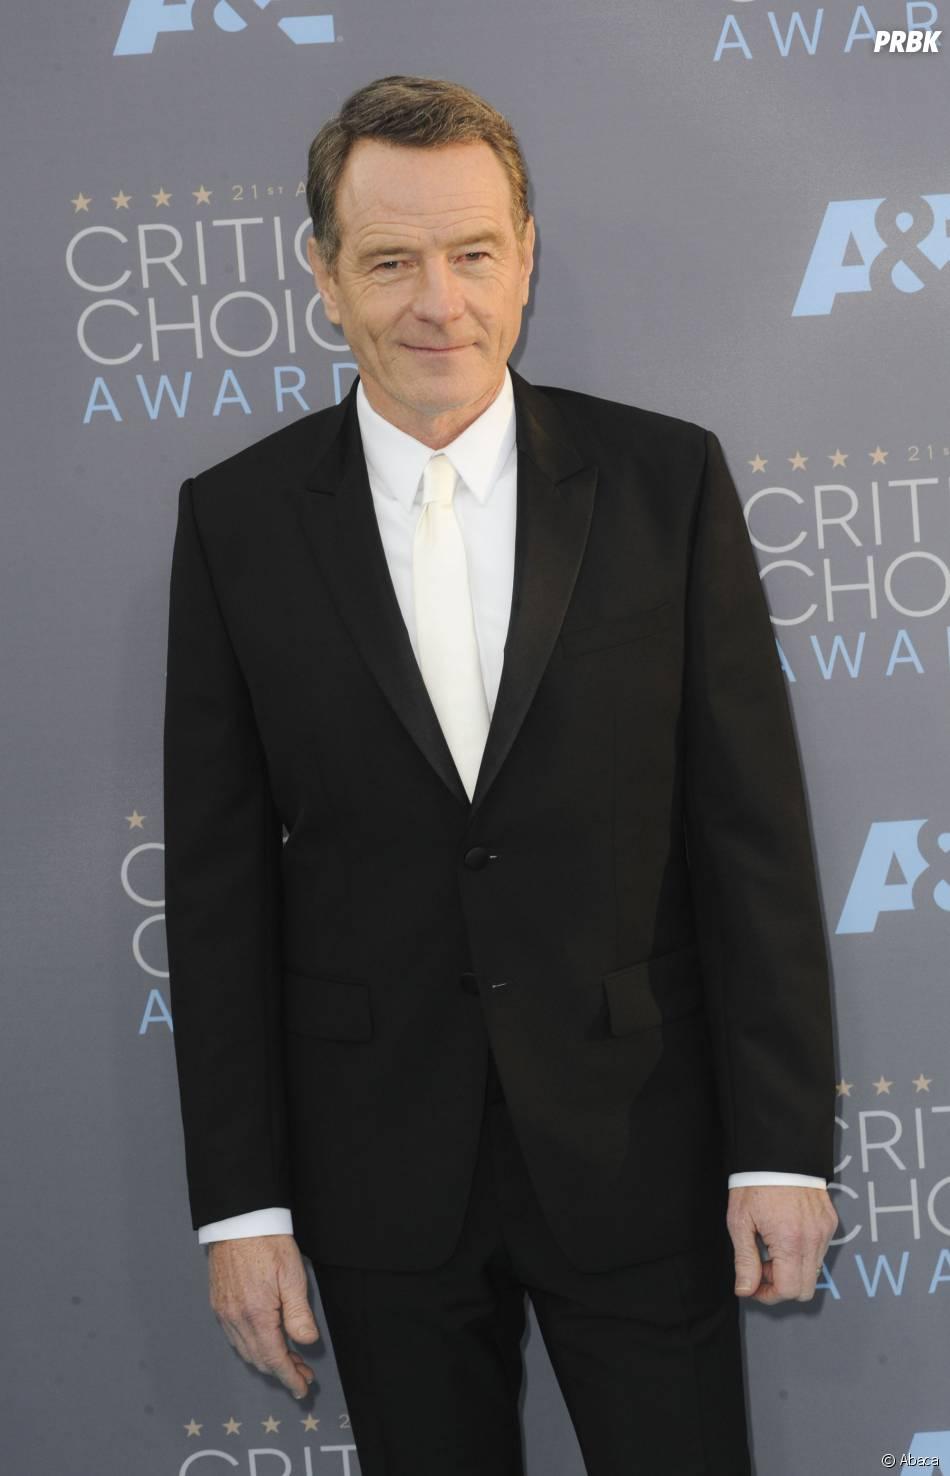 Critics Choice Awards du 17 janvier 2016 : Bryan Cranston